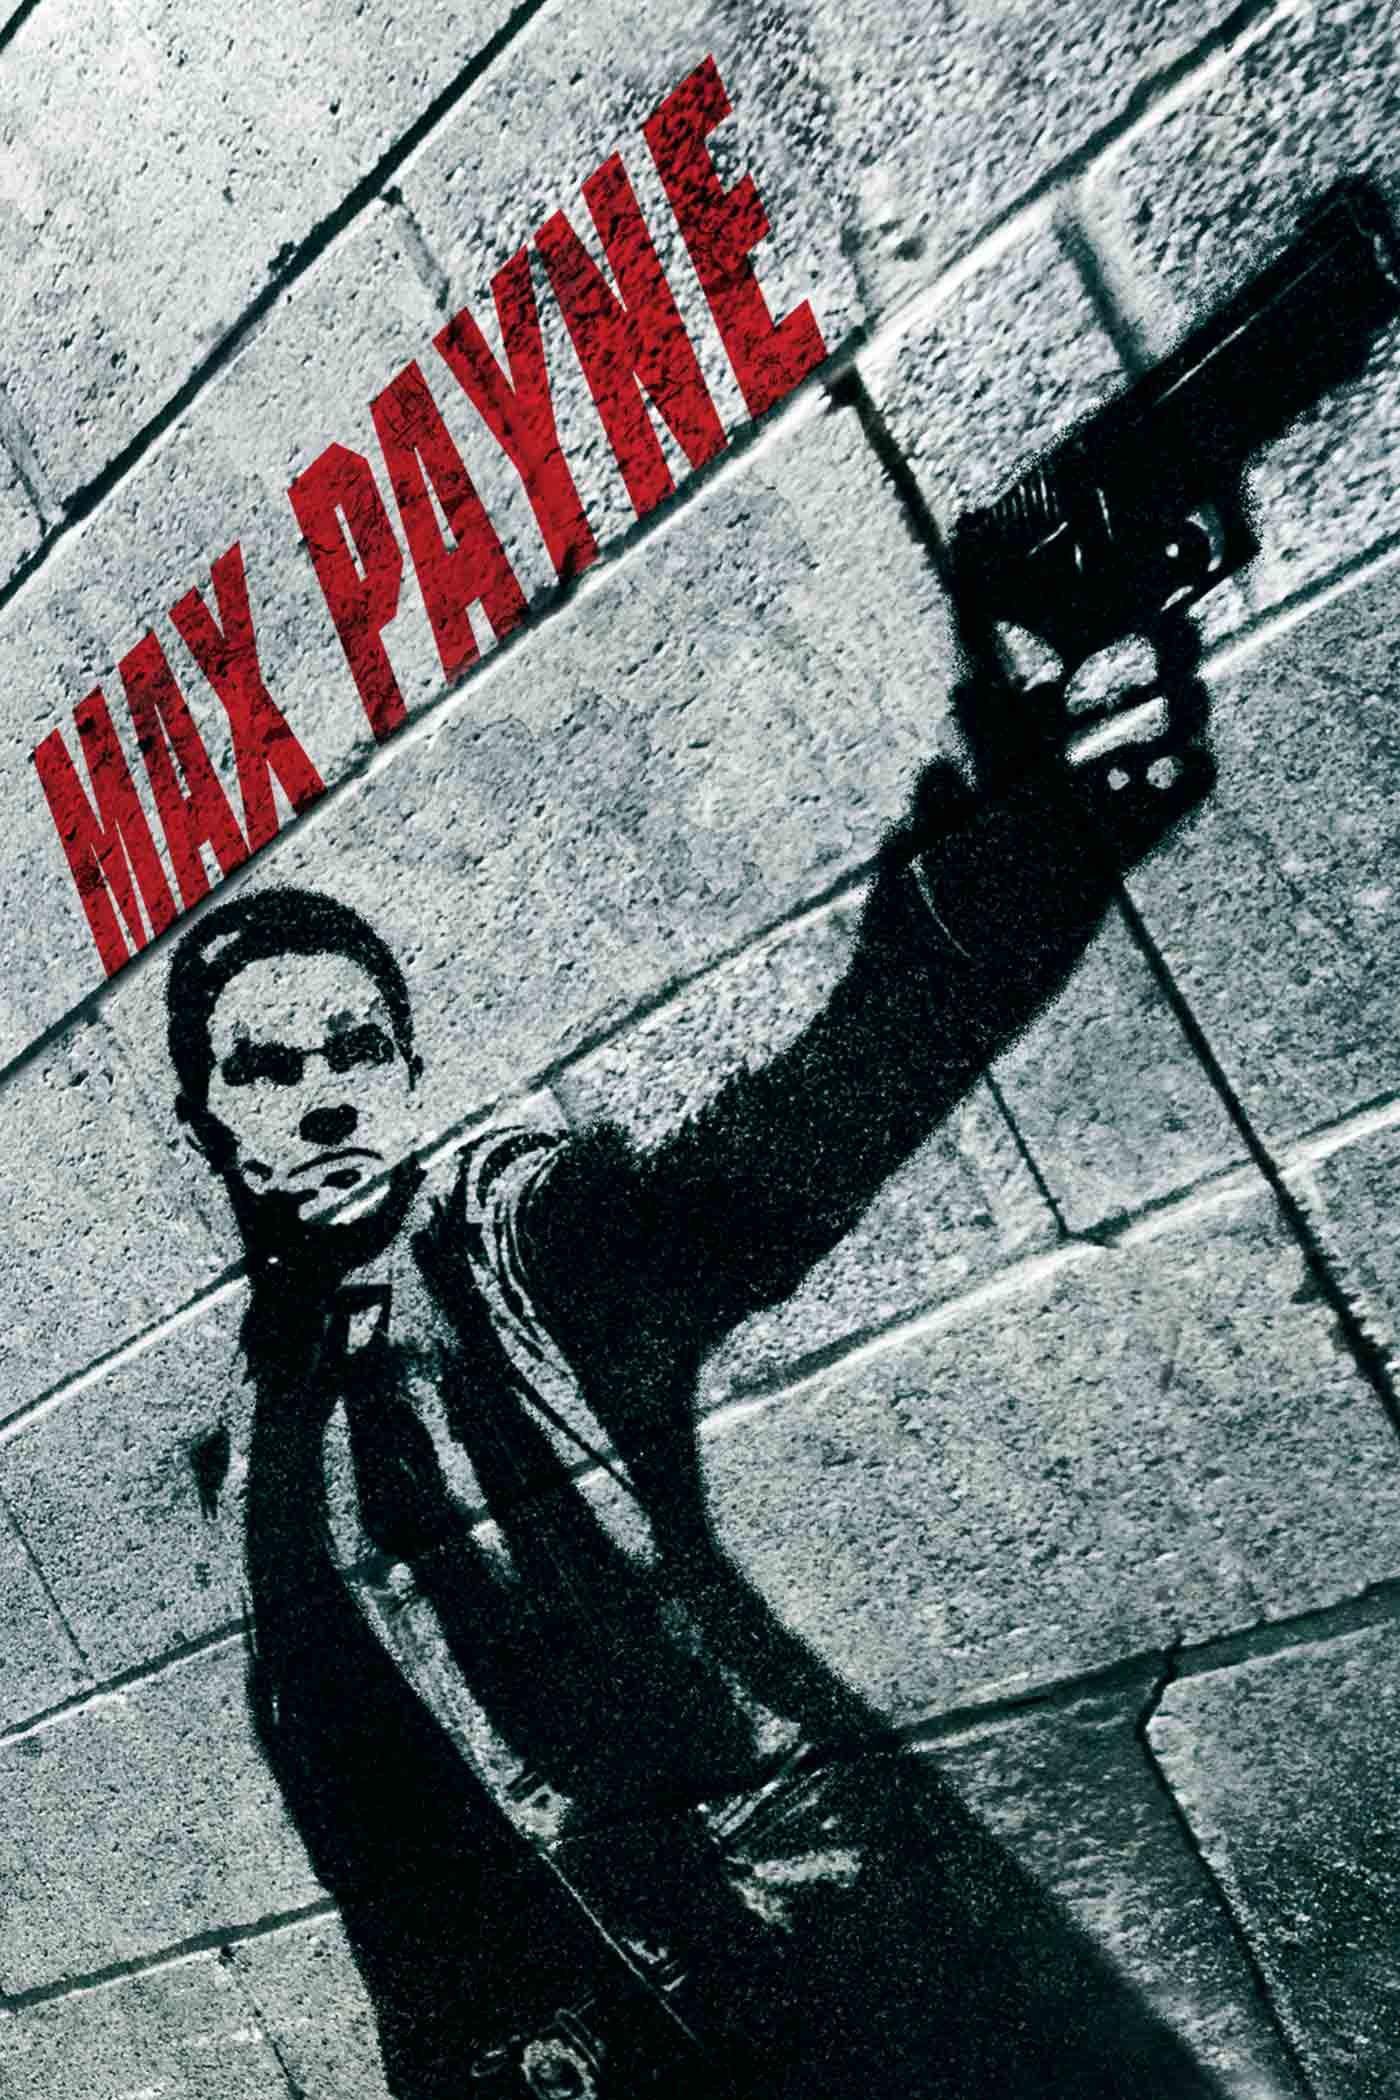 Max Payne Full Movie Movies Anywhere